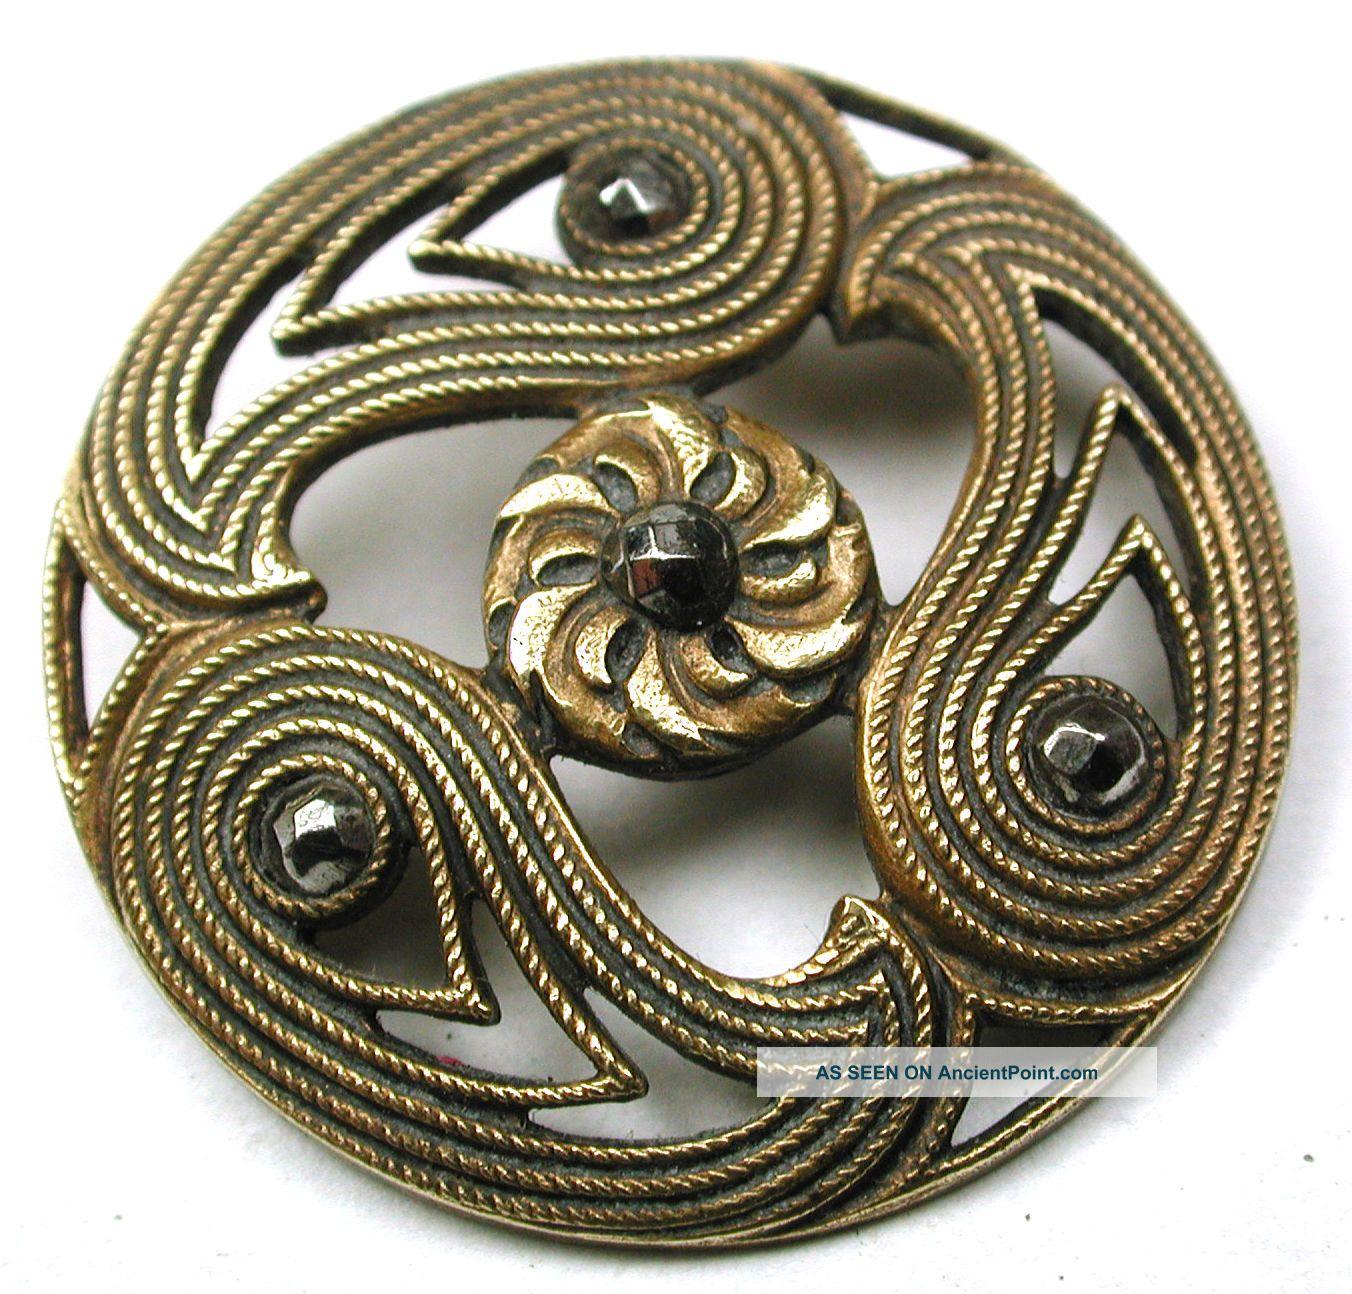 Antique Pierced Brass Button 3 Paisleys W/ Flower & Cut Steel Accents 1 & 1/16 Buttons photo